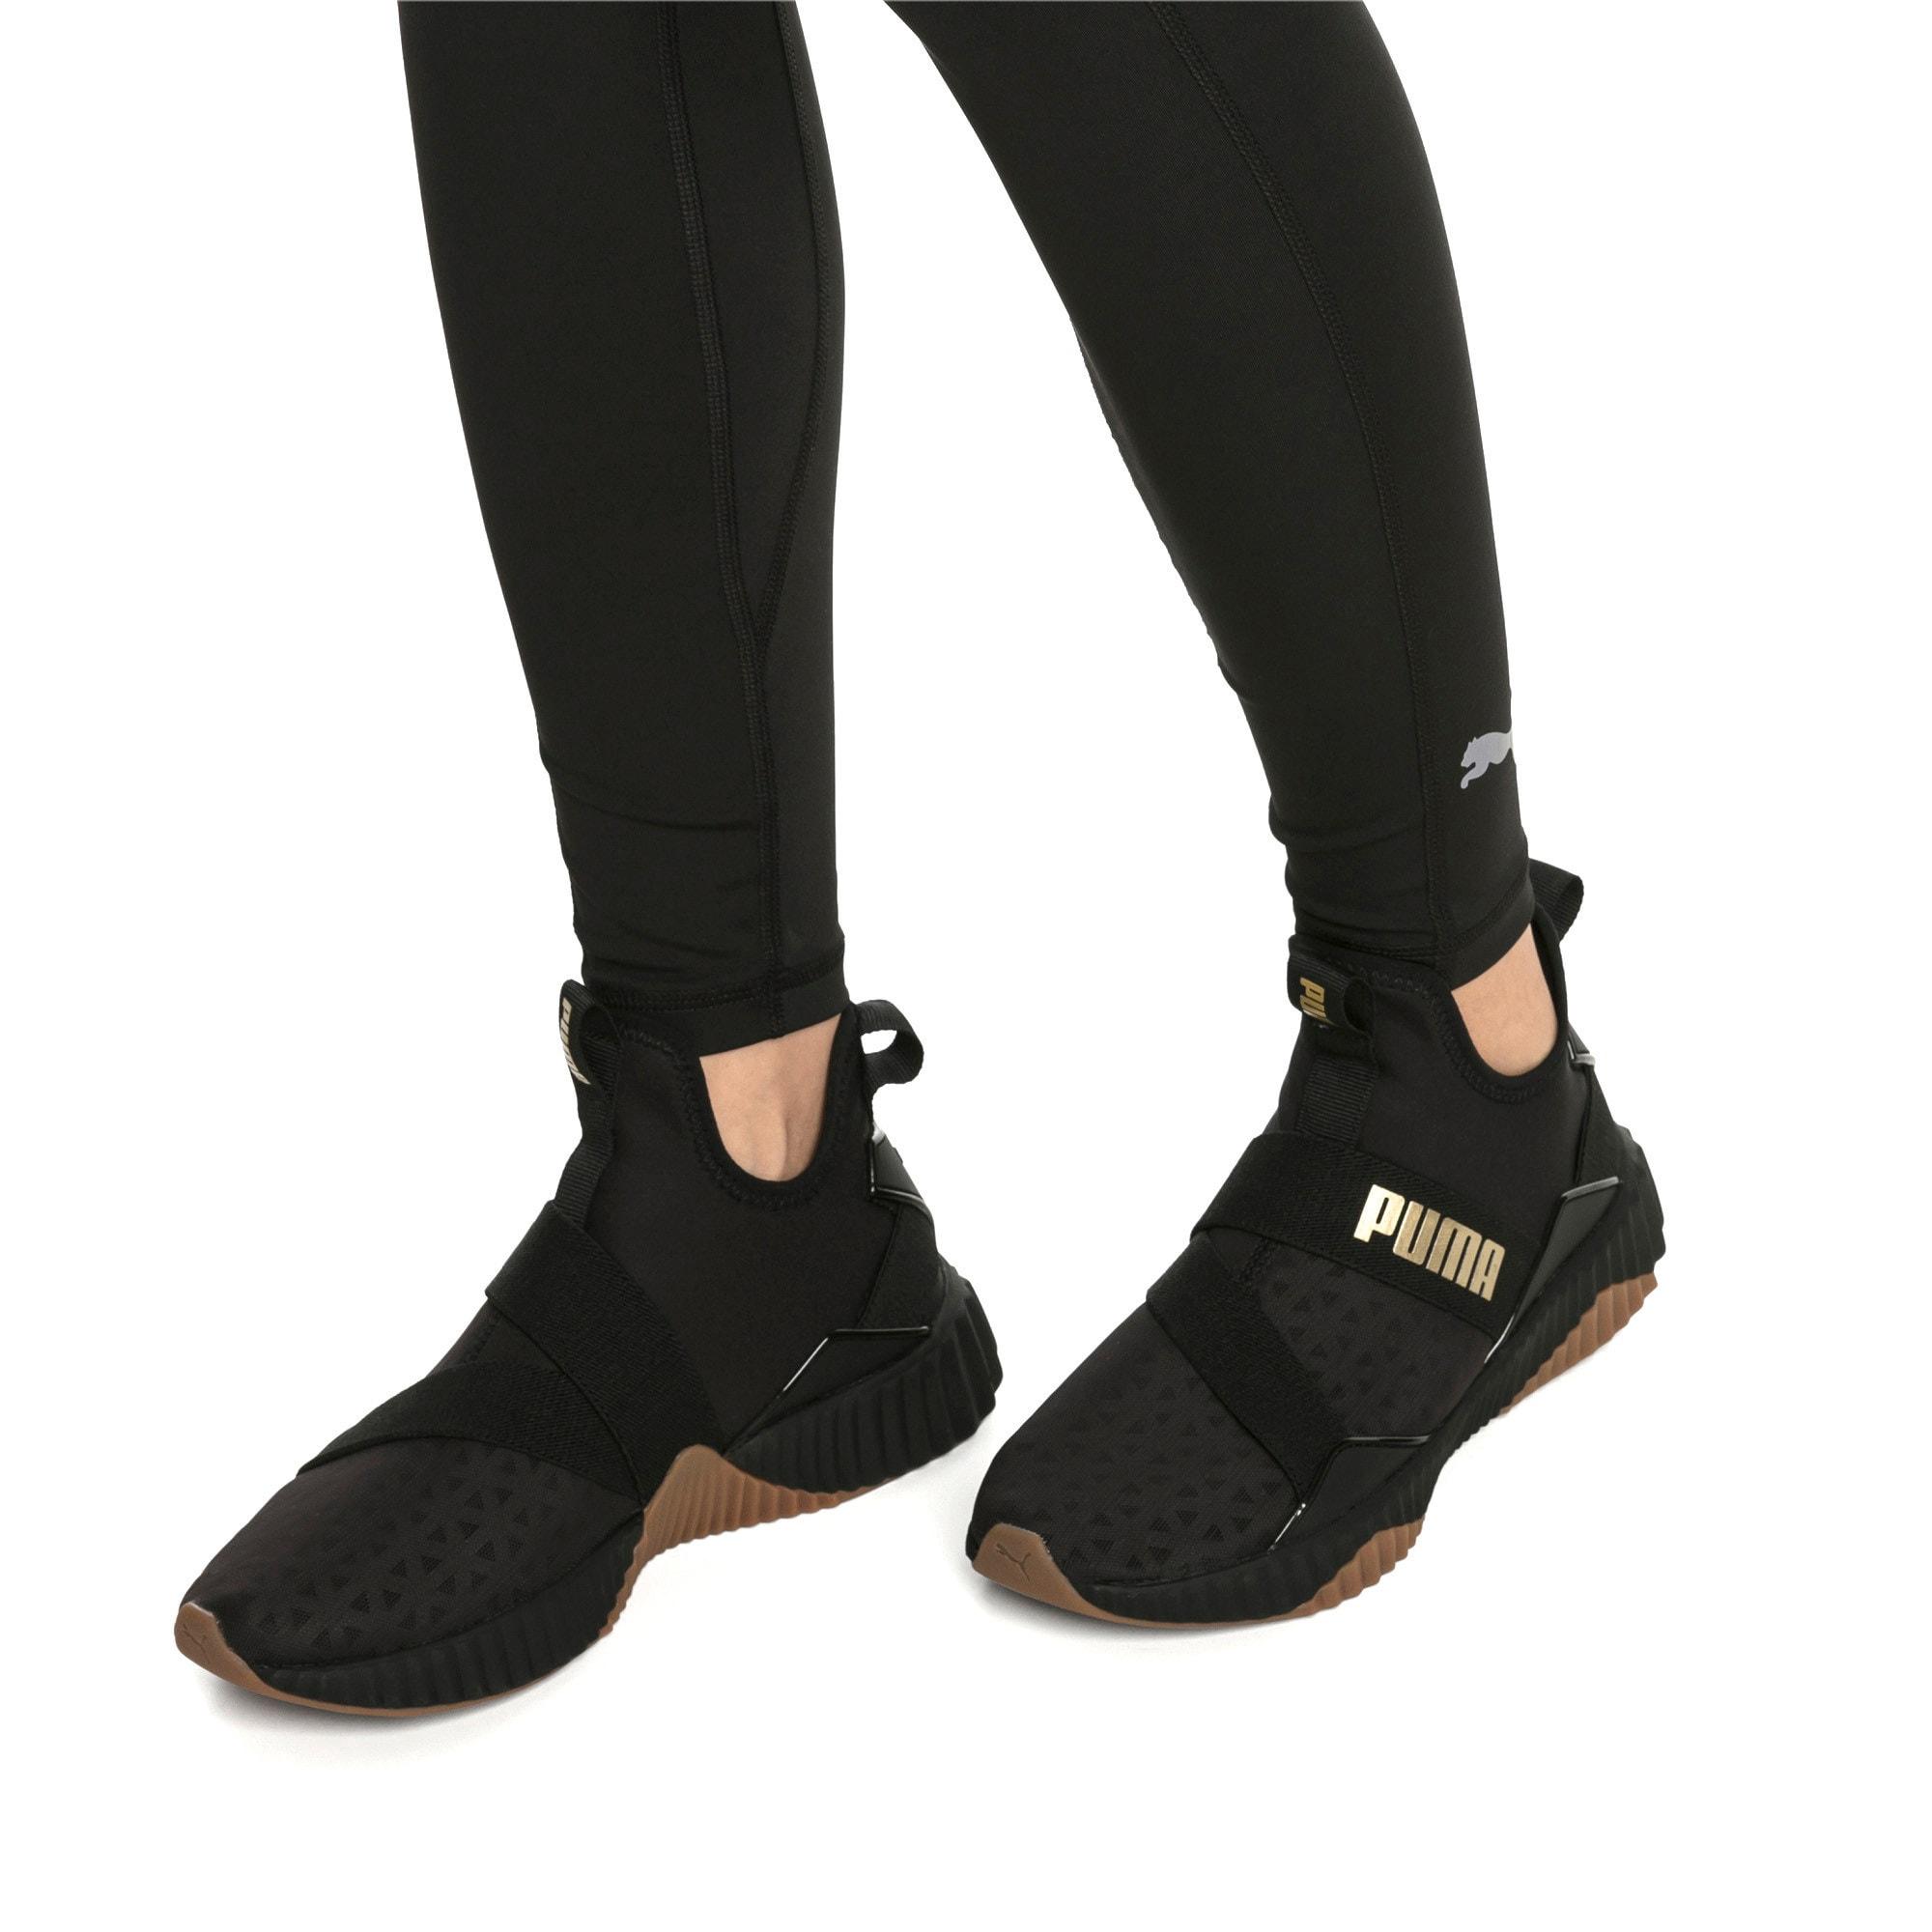 Thumbnail 2 of Defy Mid Sparkle Damen Sneaker, Puma Black-Metallic Gold, medium